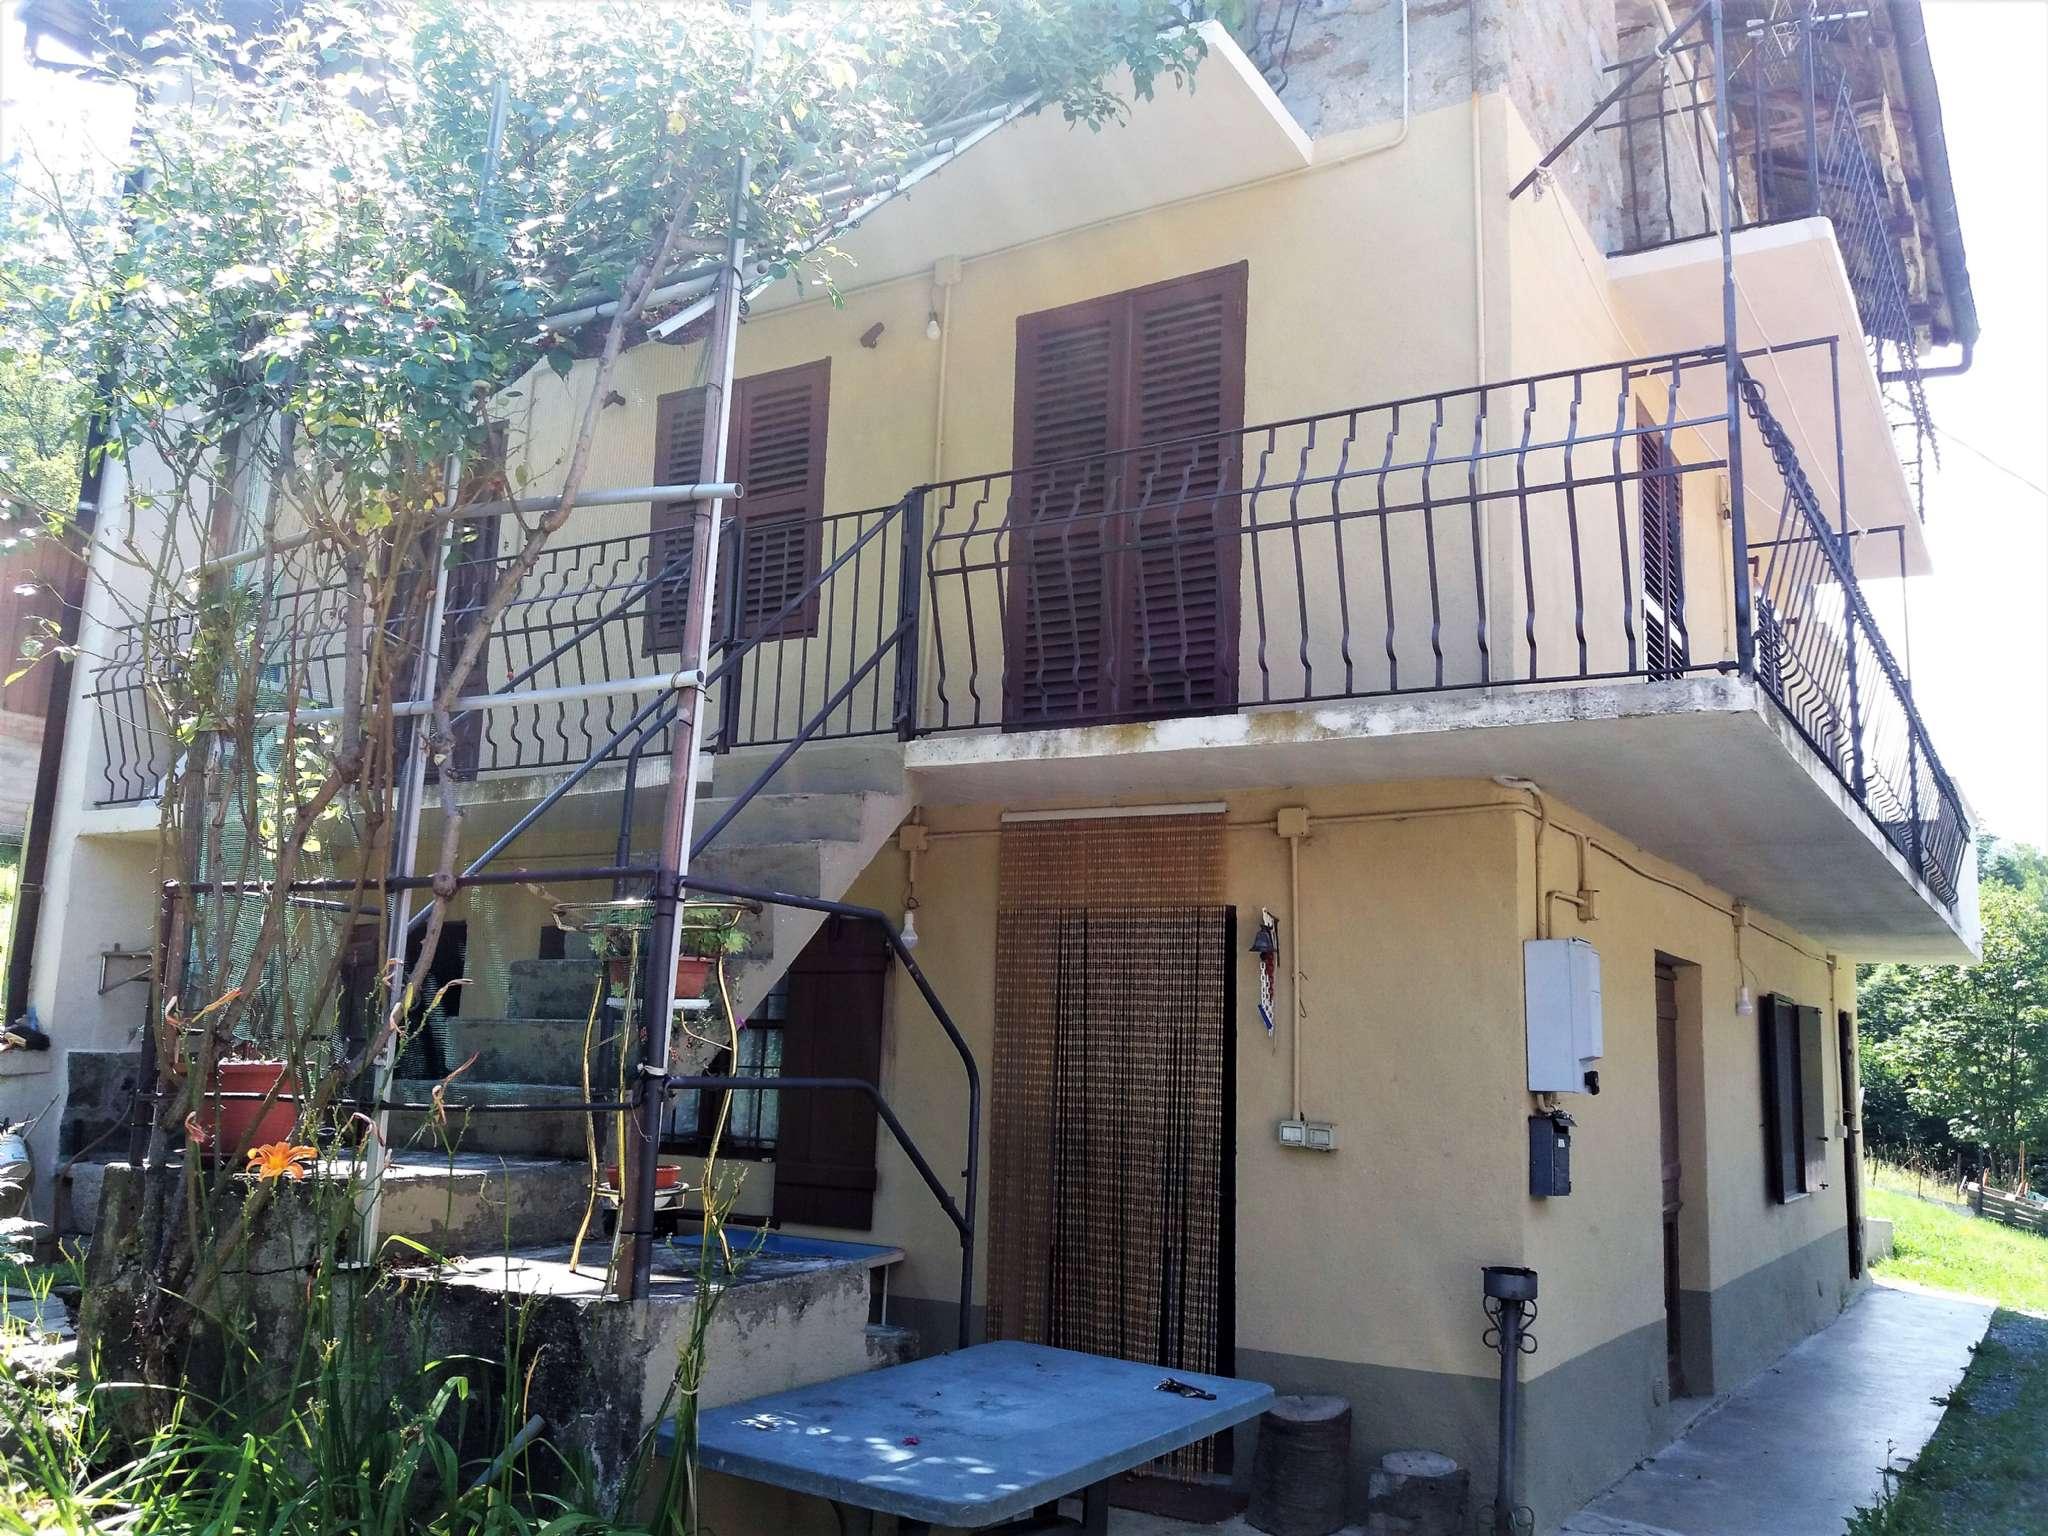 Foto 1 di Casa indipendente SP32, Germagnano